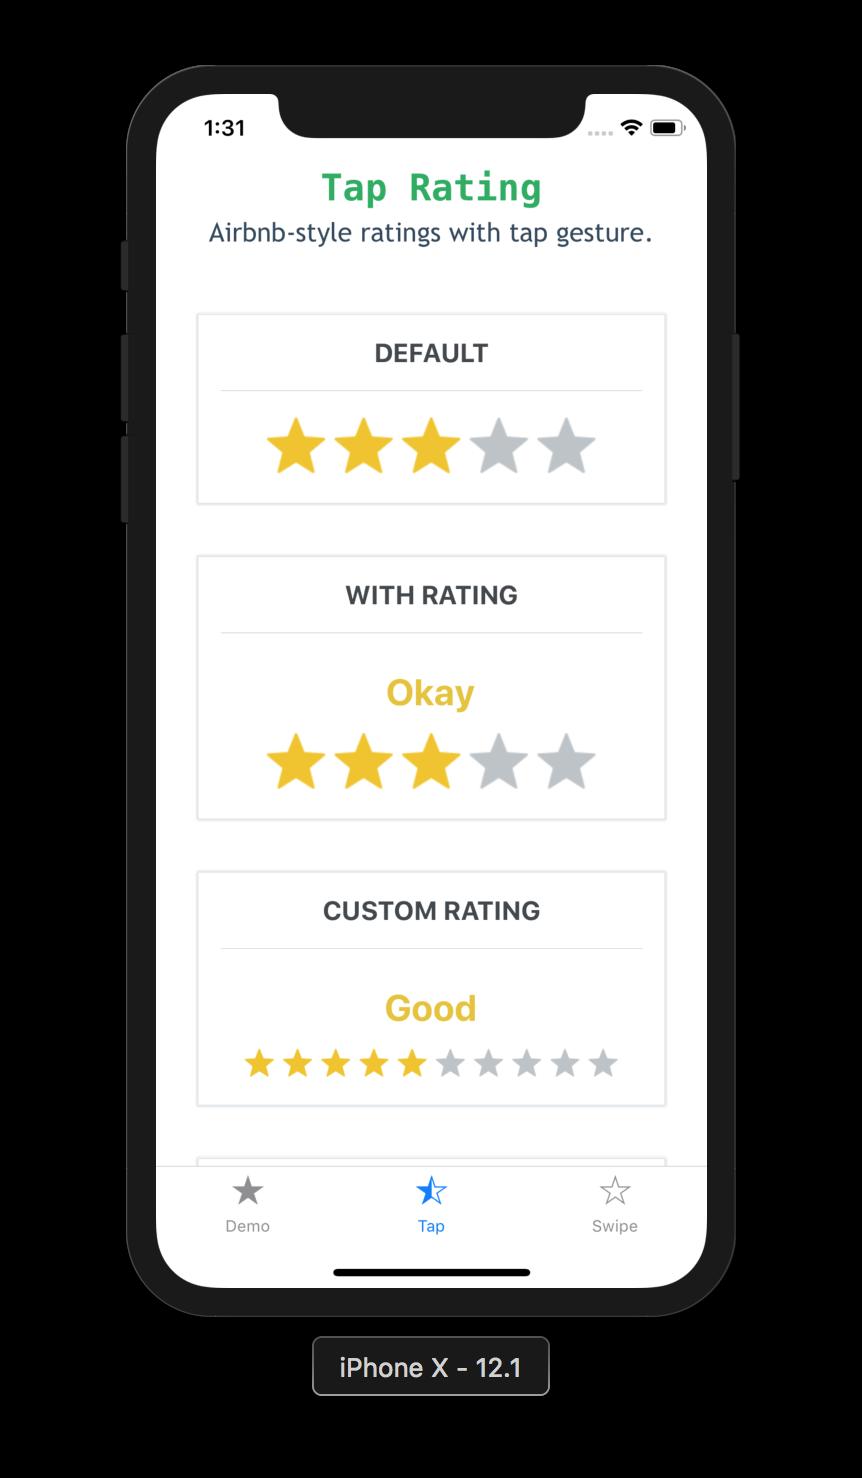 react-native-ratings - npm